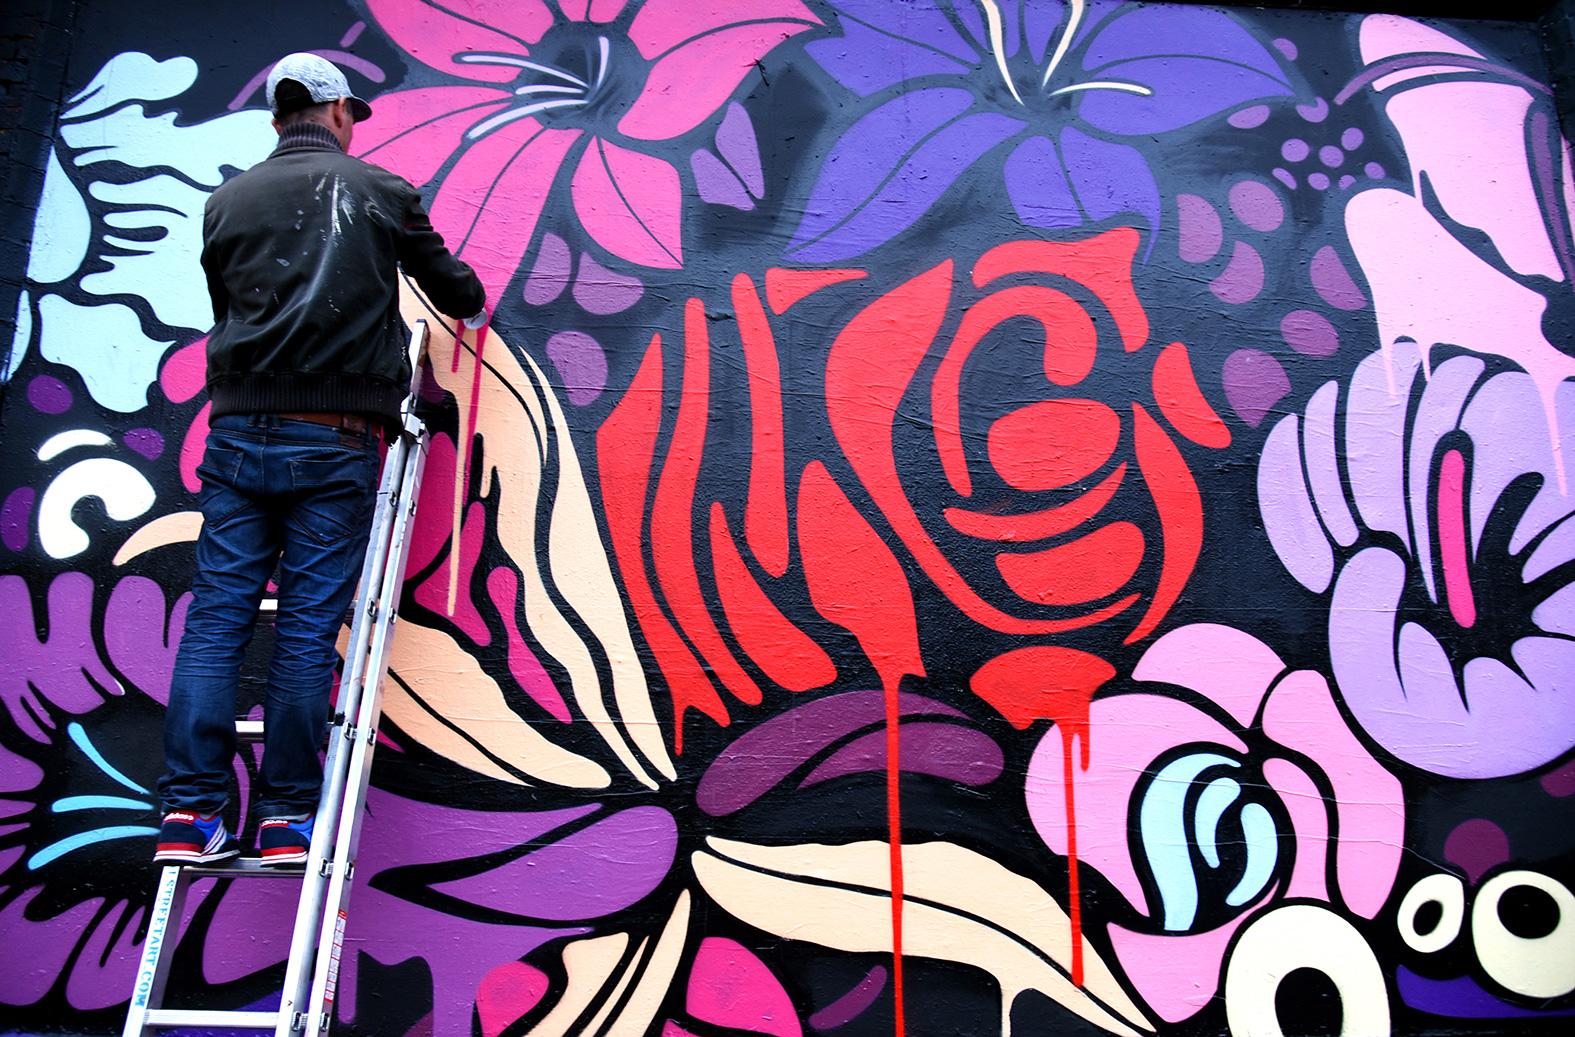 Nerone-street-art-london-9